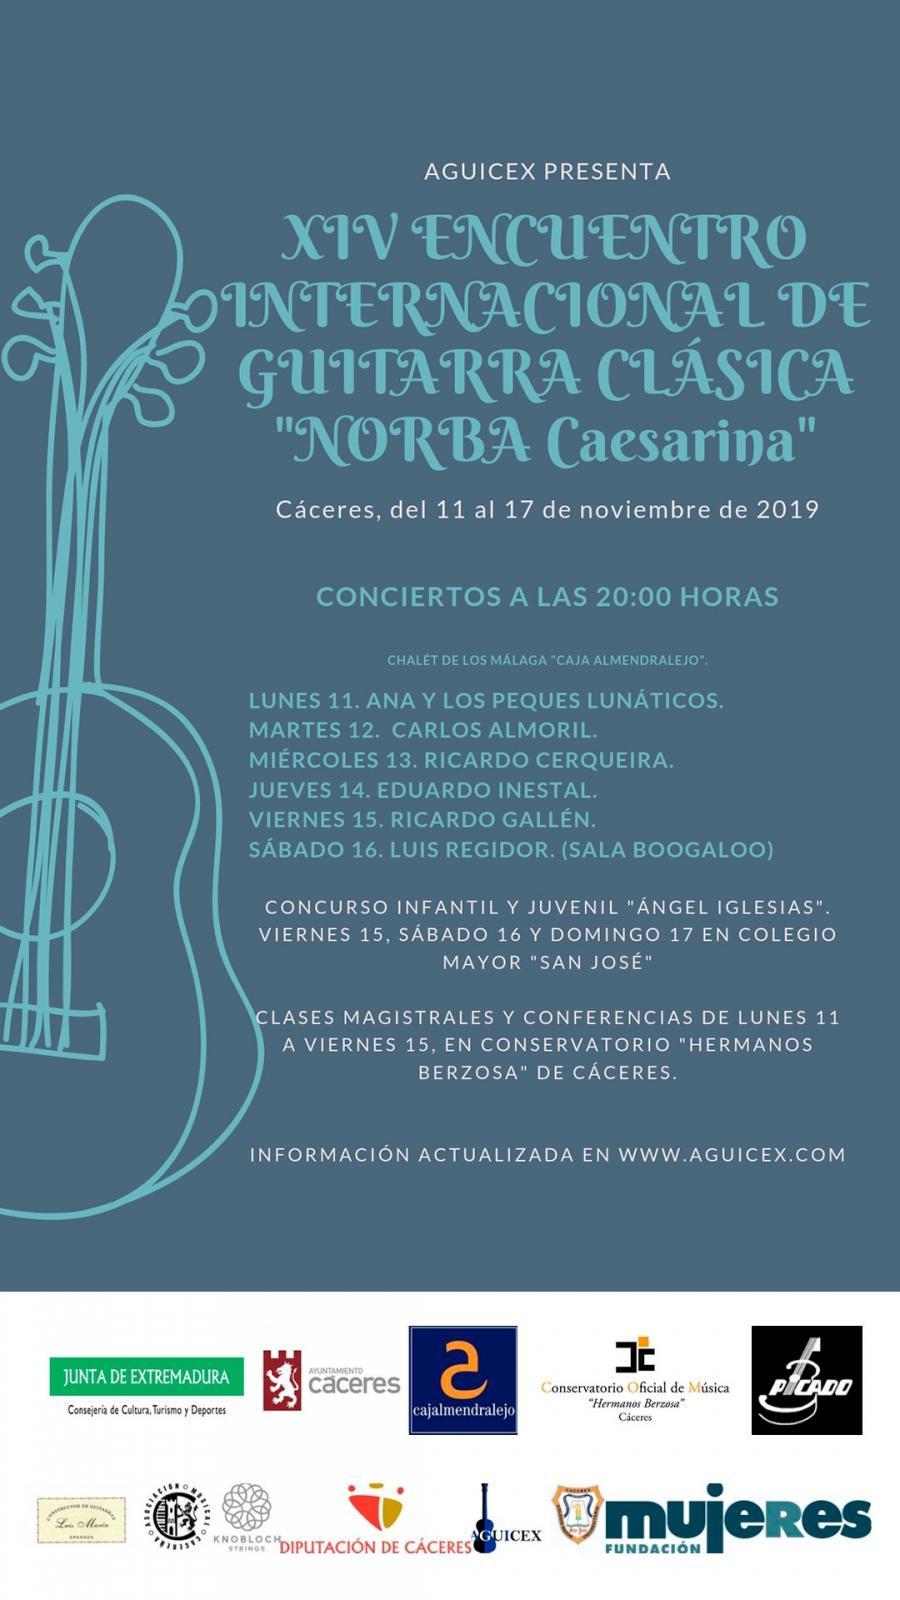 XIV Encuentro Internacional de Guitarra Clásica «Norba Caesarina» 2019 |  CONCURSO JUVENIL